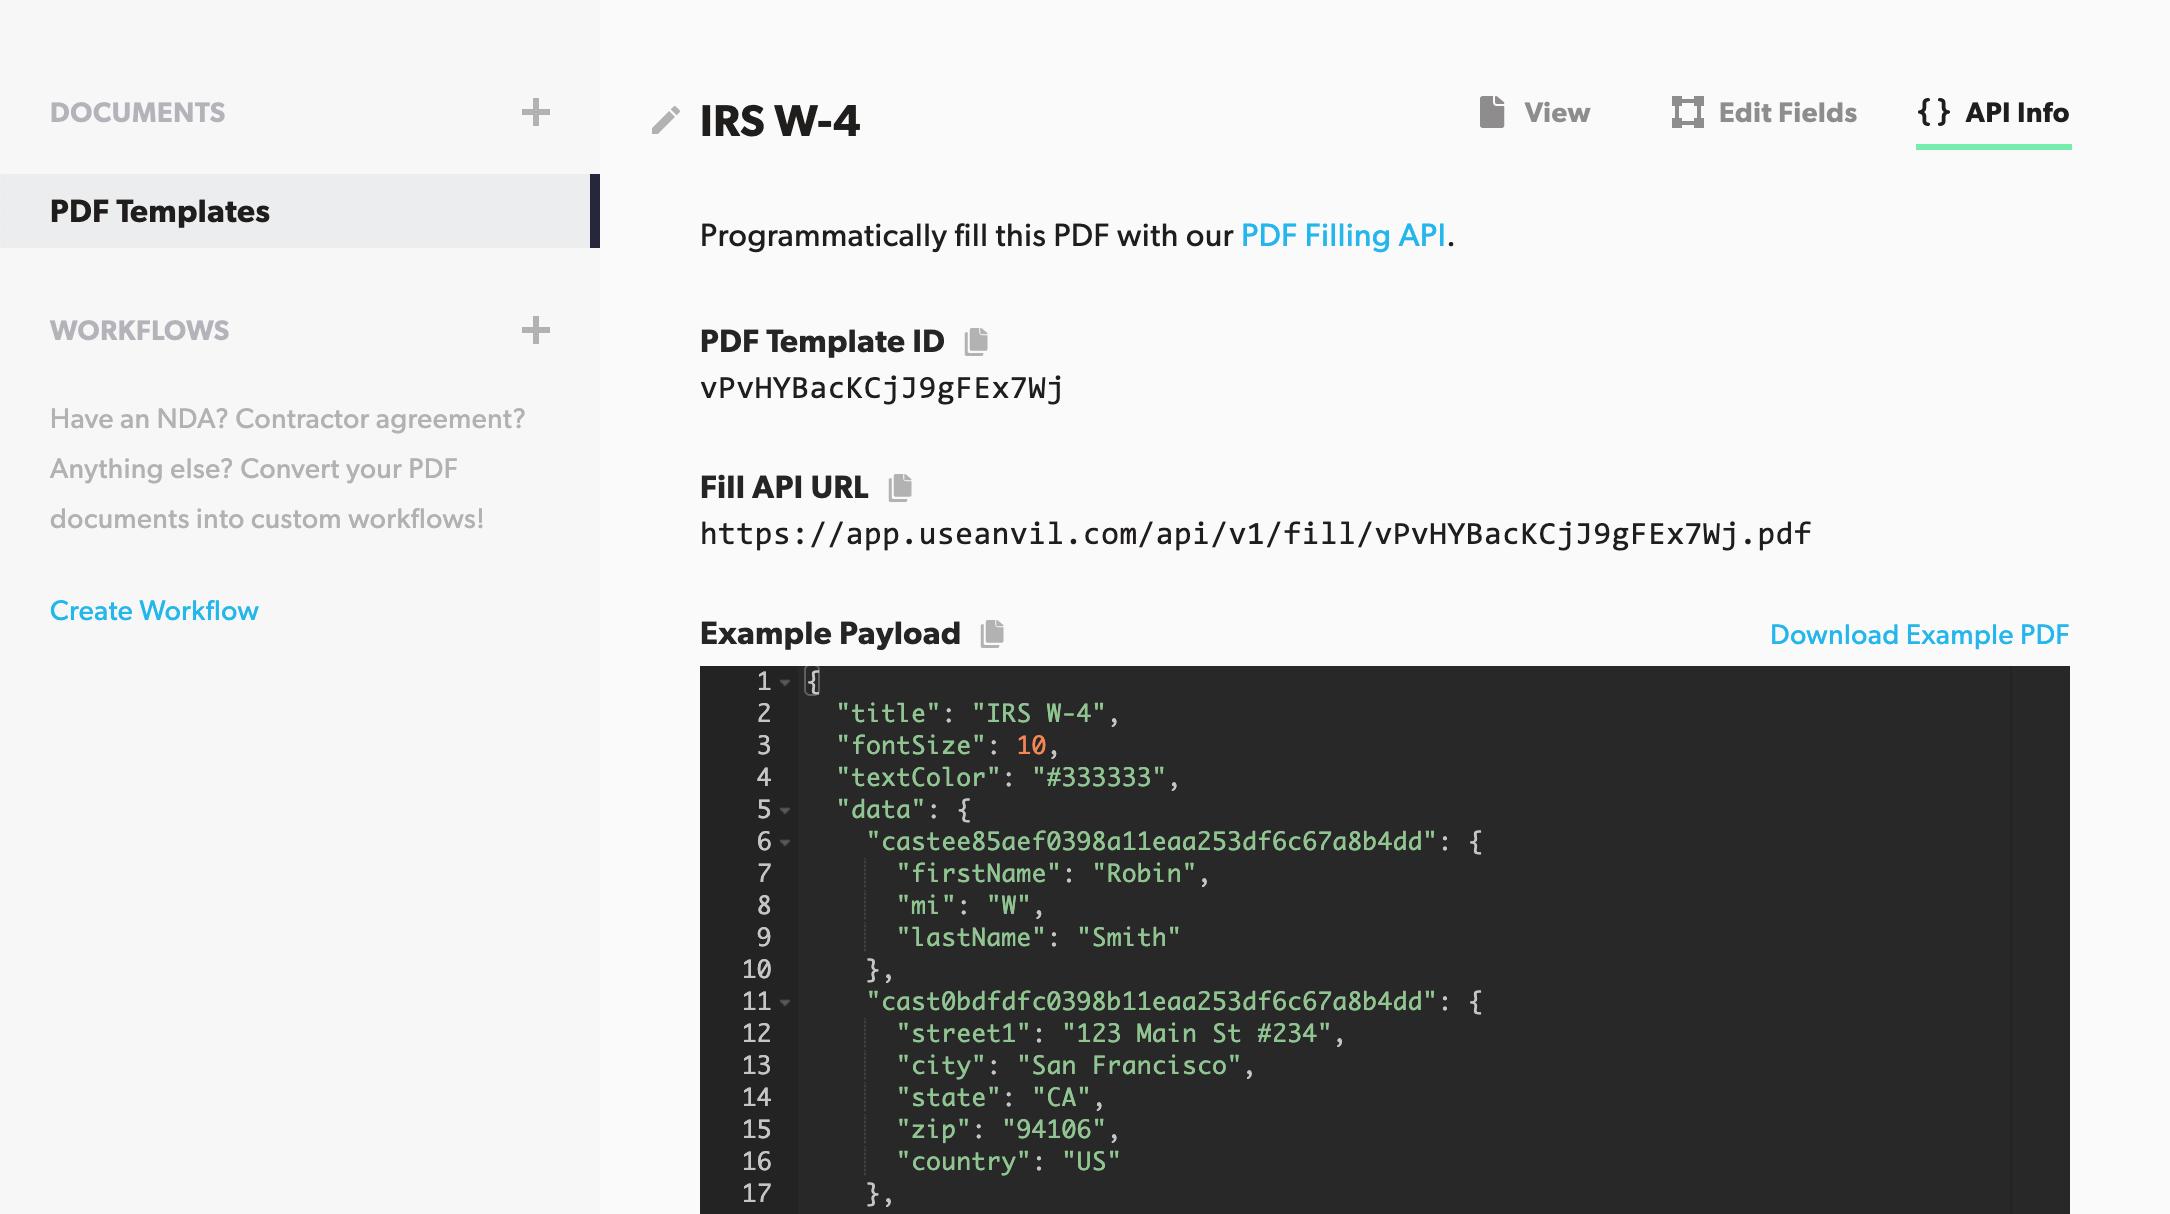 Viewing PDF Template API Info